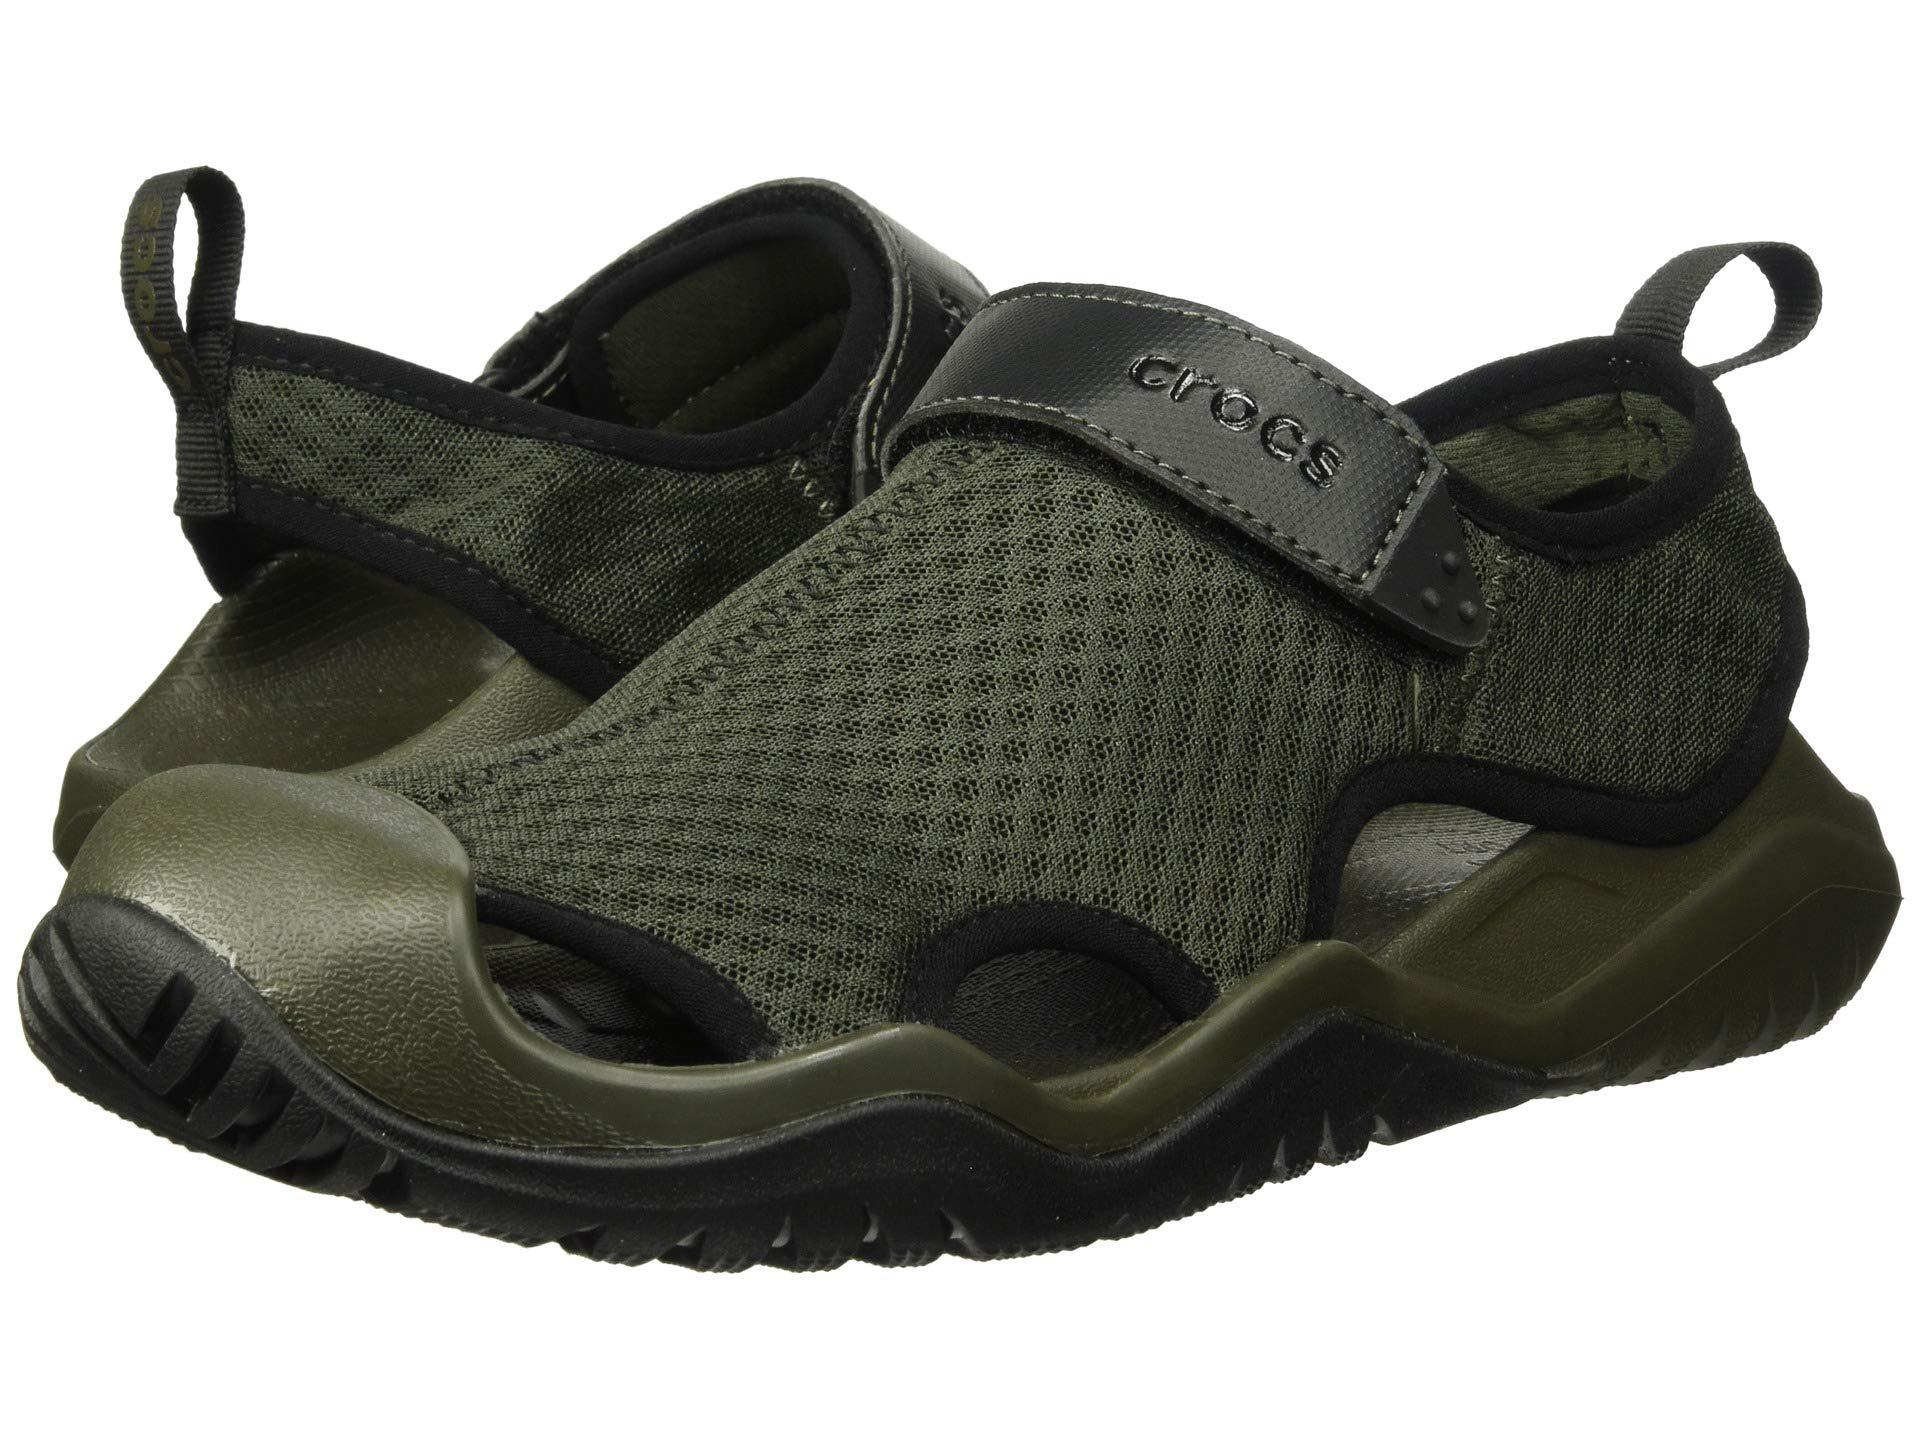 58c35b615b3b Lyst - Crocs™ Swiftwater Mesh Deck Sandal in Green for Men - Save 5%